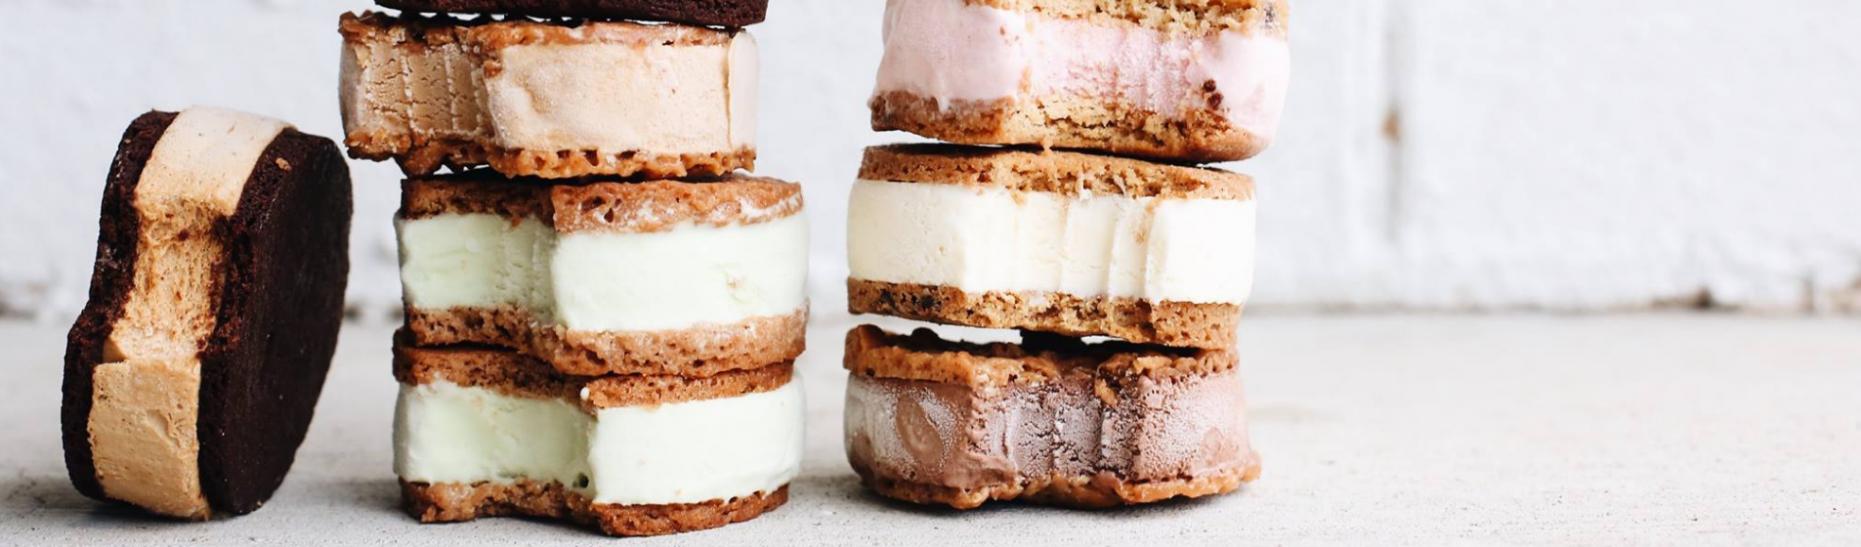 Pat and Sticks Ice Cream Sandwiches